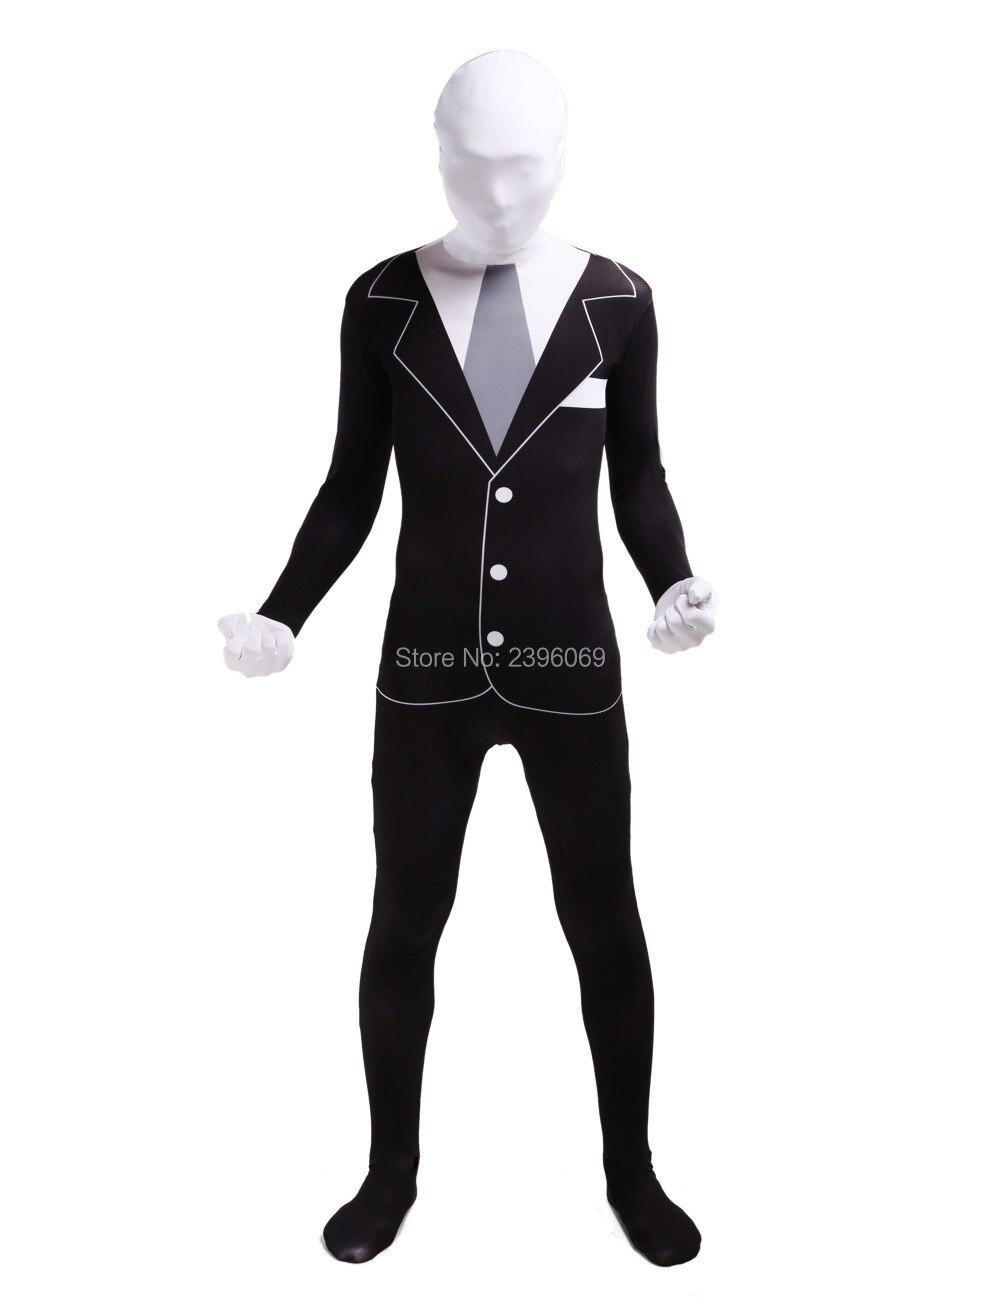 (LS002)) Black And White Gentleman Zentai Suit Full Body Gentleman Cosplay Zenai Fetish Suits Halloween Costume-in Zentai from Novelty & Special Use    1